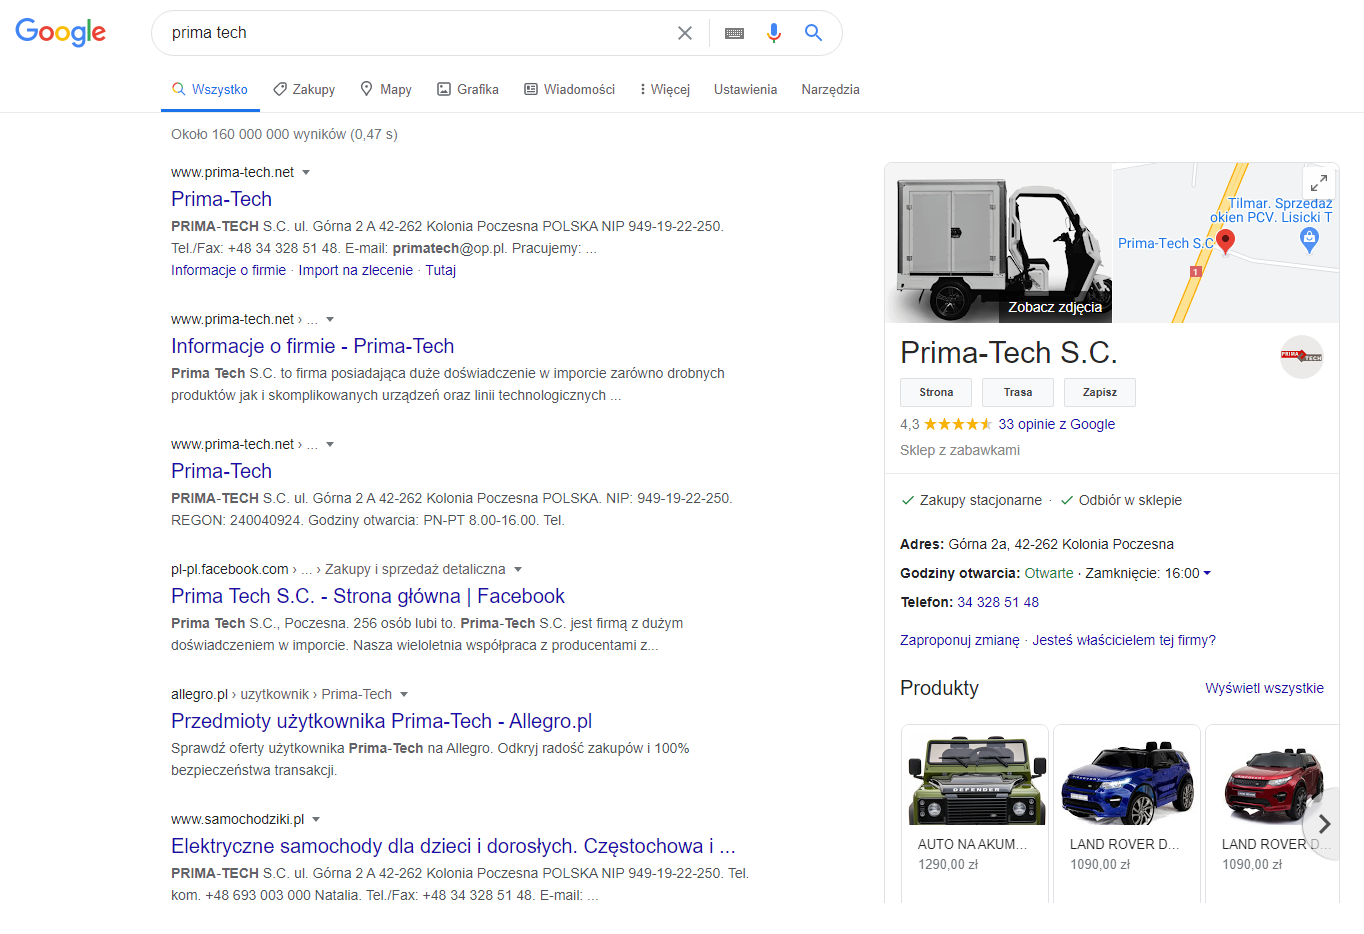 Google positioning - sale increasing